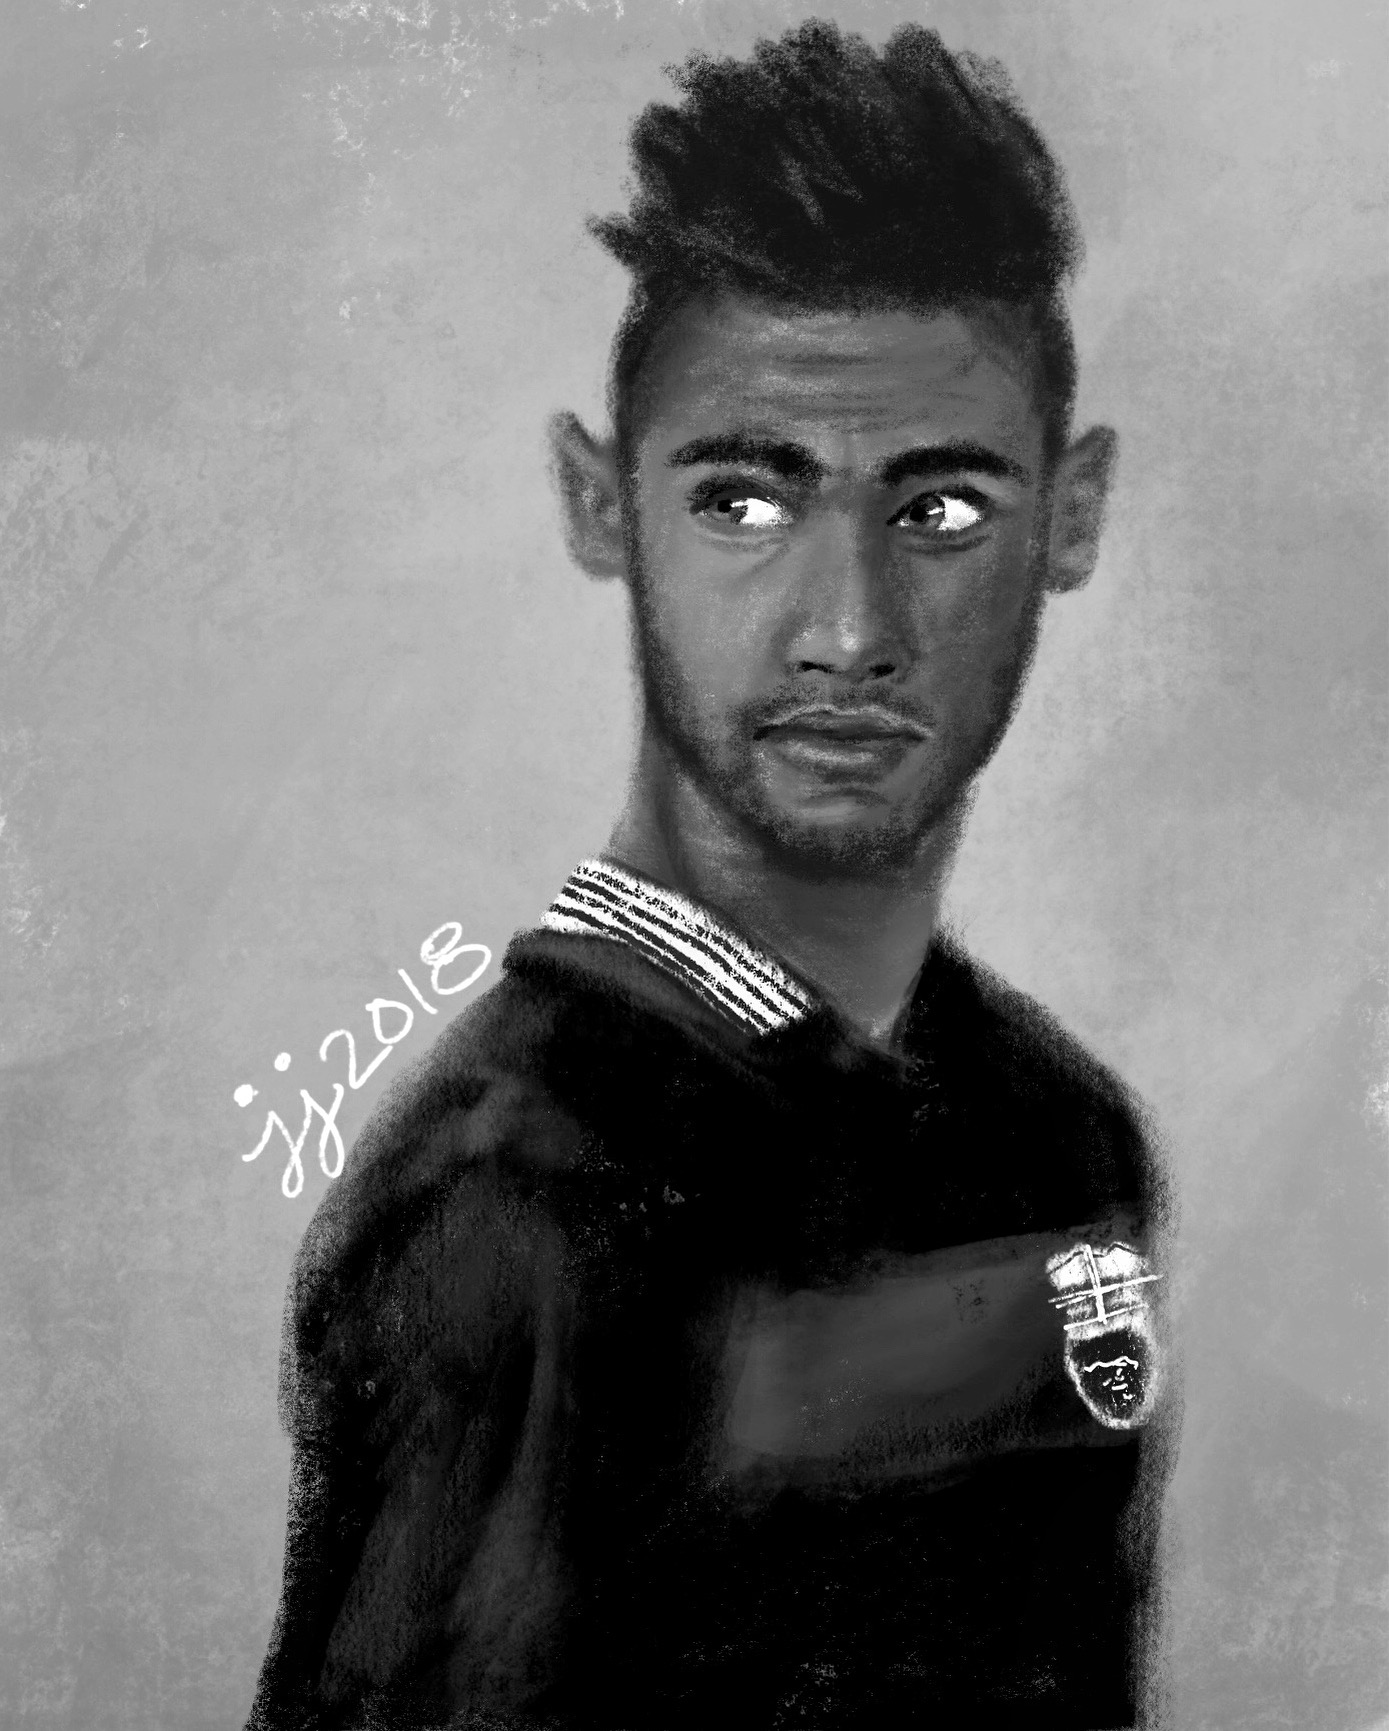 Copy of Brazilian Footballer Neymar Jr.